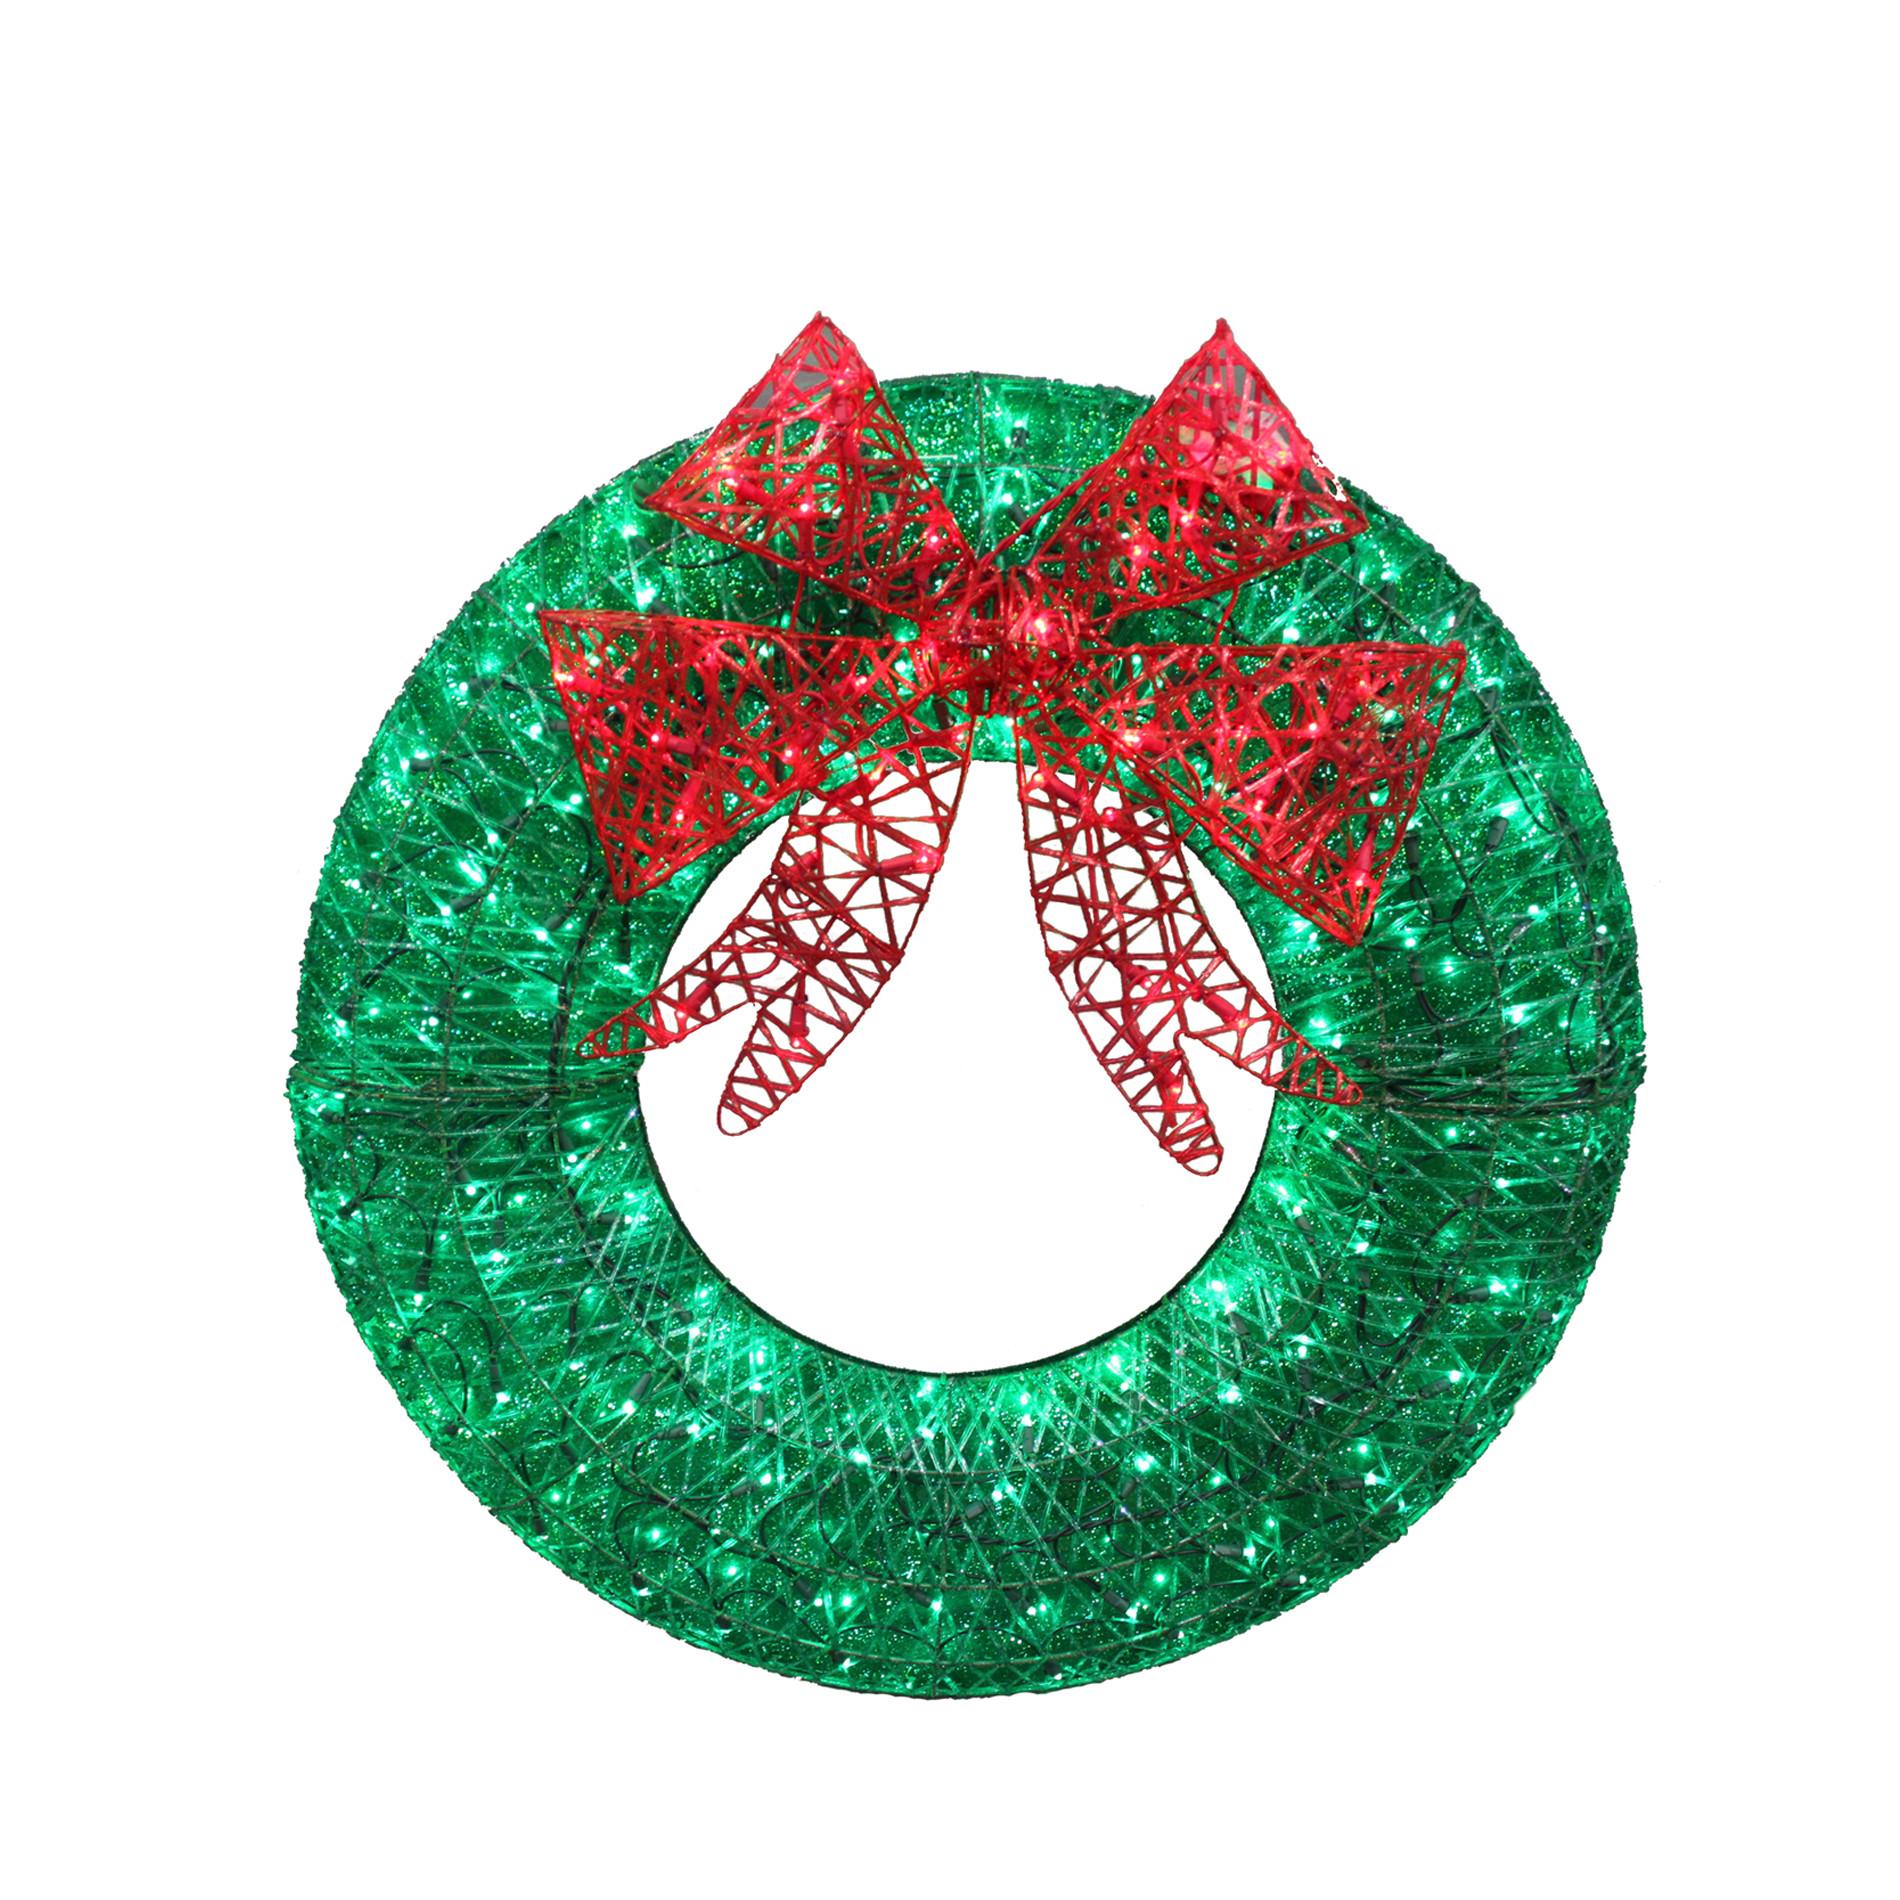 "Plastic Outdoor Christmas Decorations Clearance  Trim A Home 140 LED Lights White Wreath 36"" Seasonal"